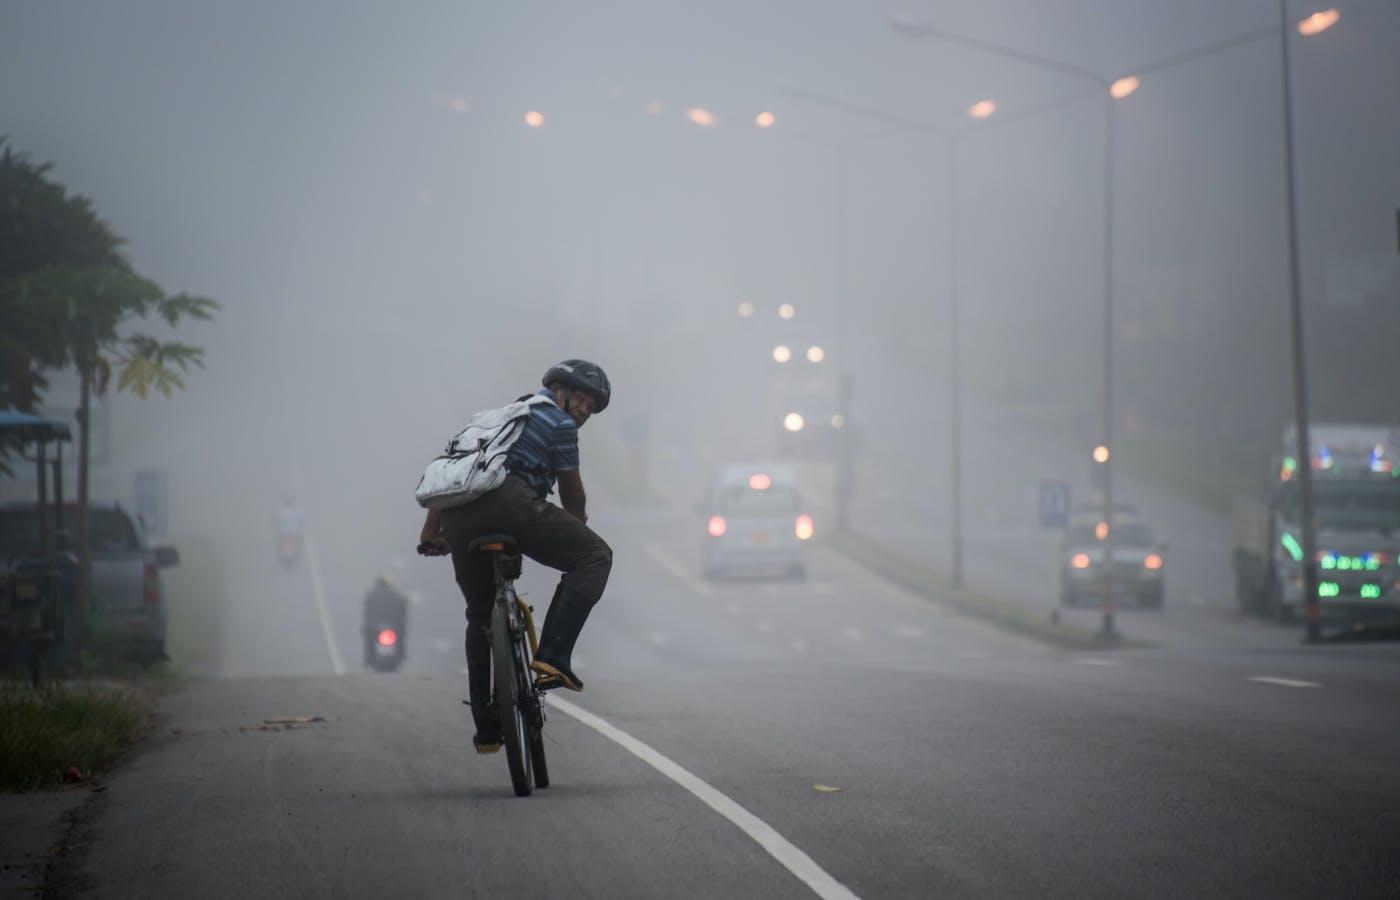 Biking related image